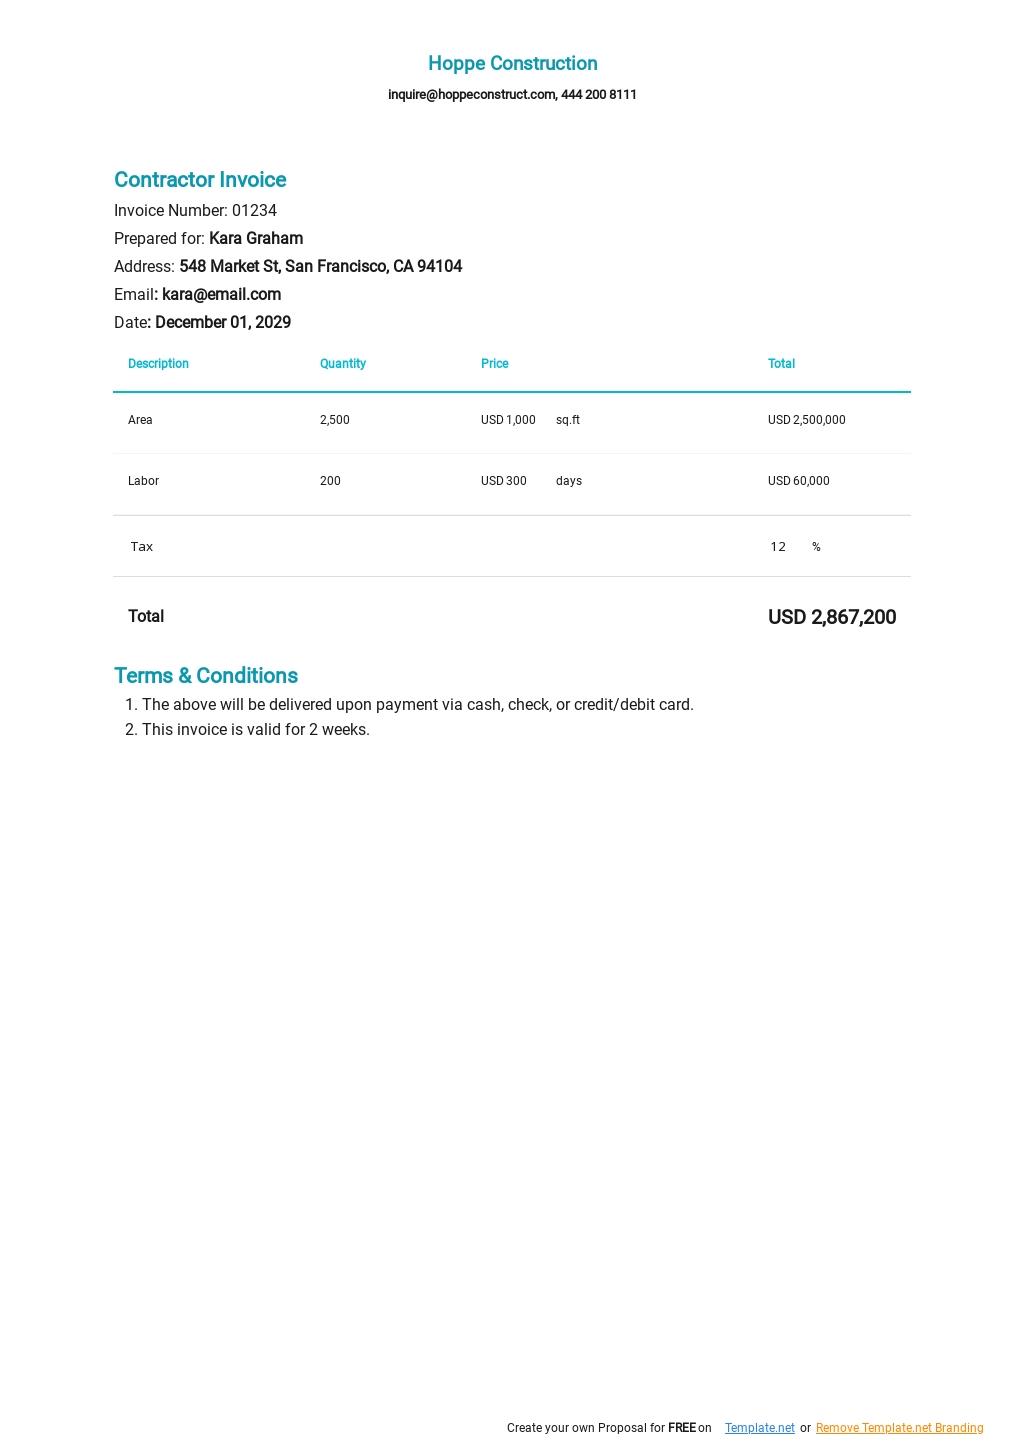 Contractor Invoice Template.jpe